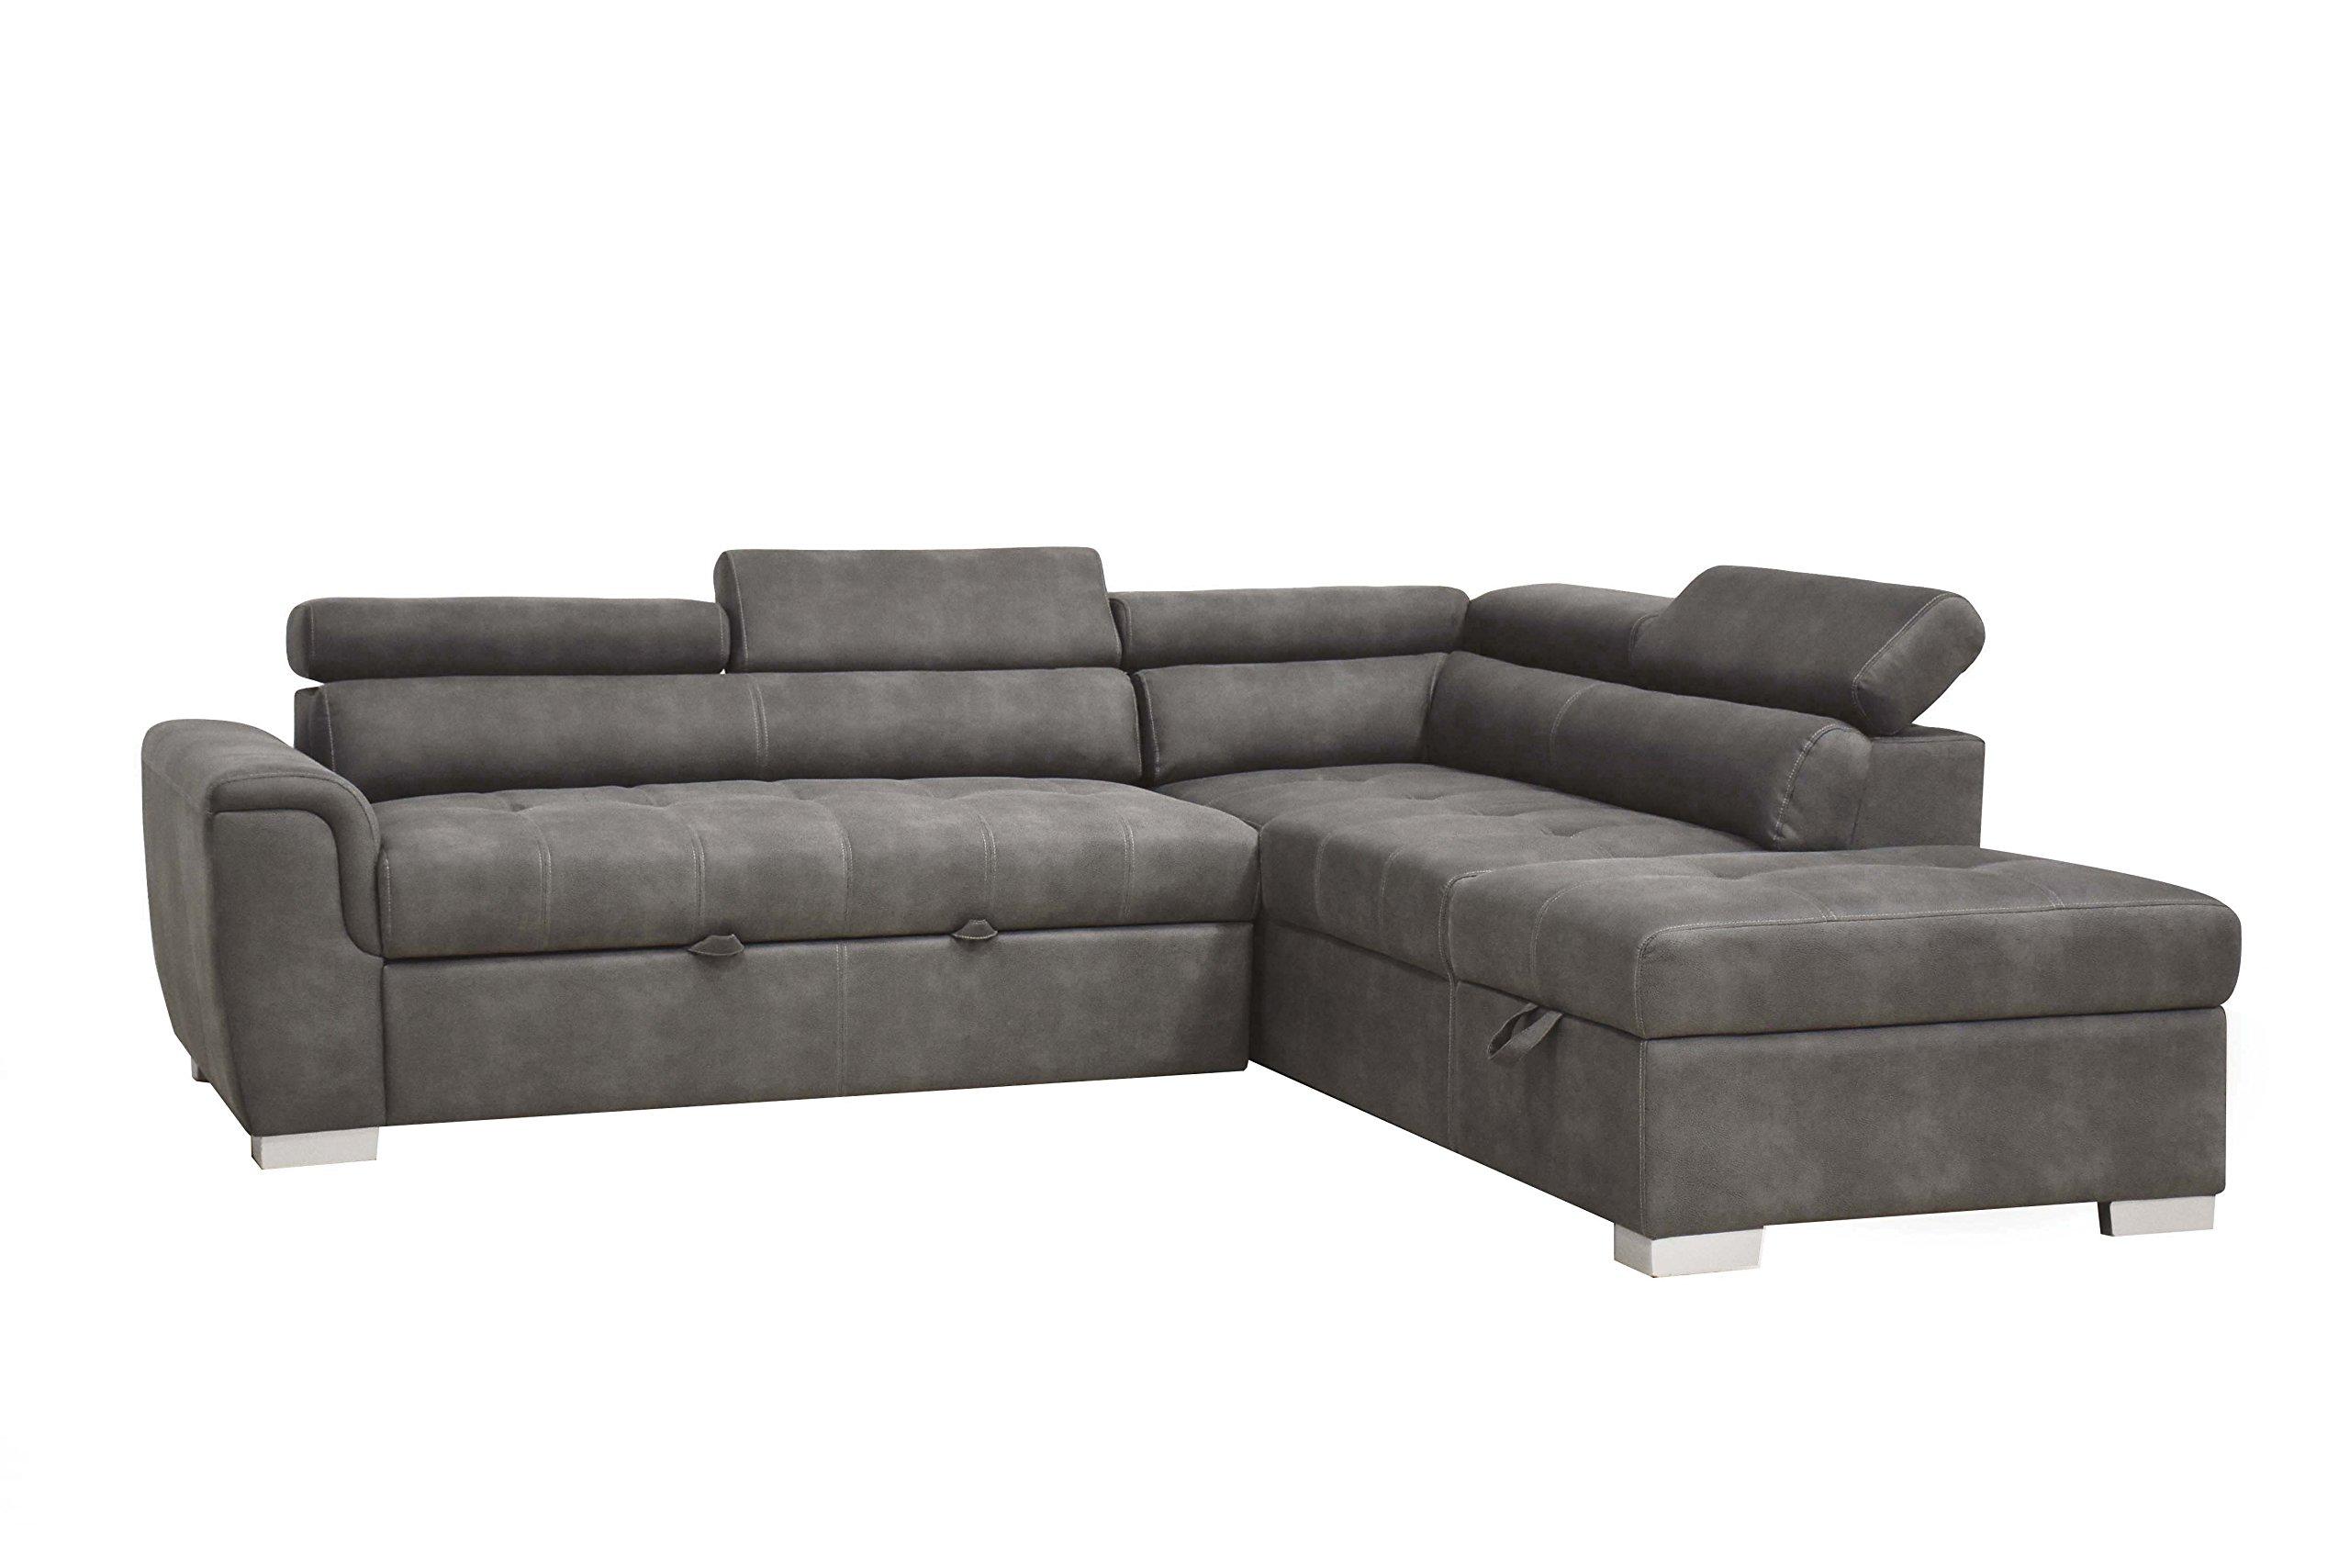 Cheap Microfiber Sectional Sleeper Sofa, find Microfiber ...